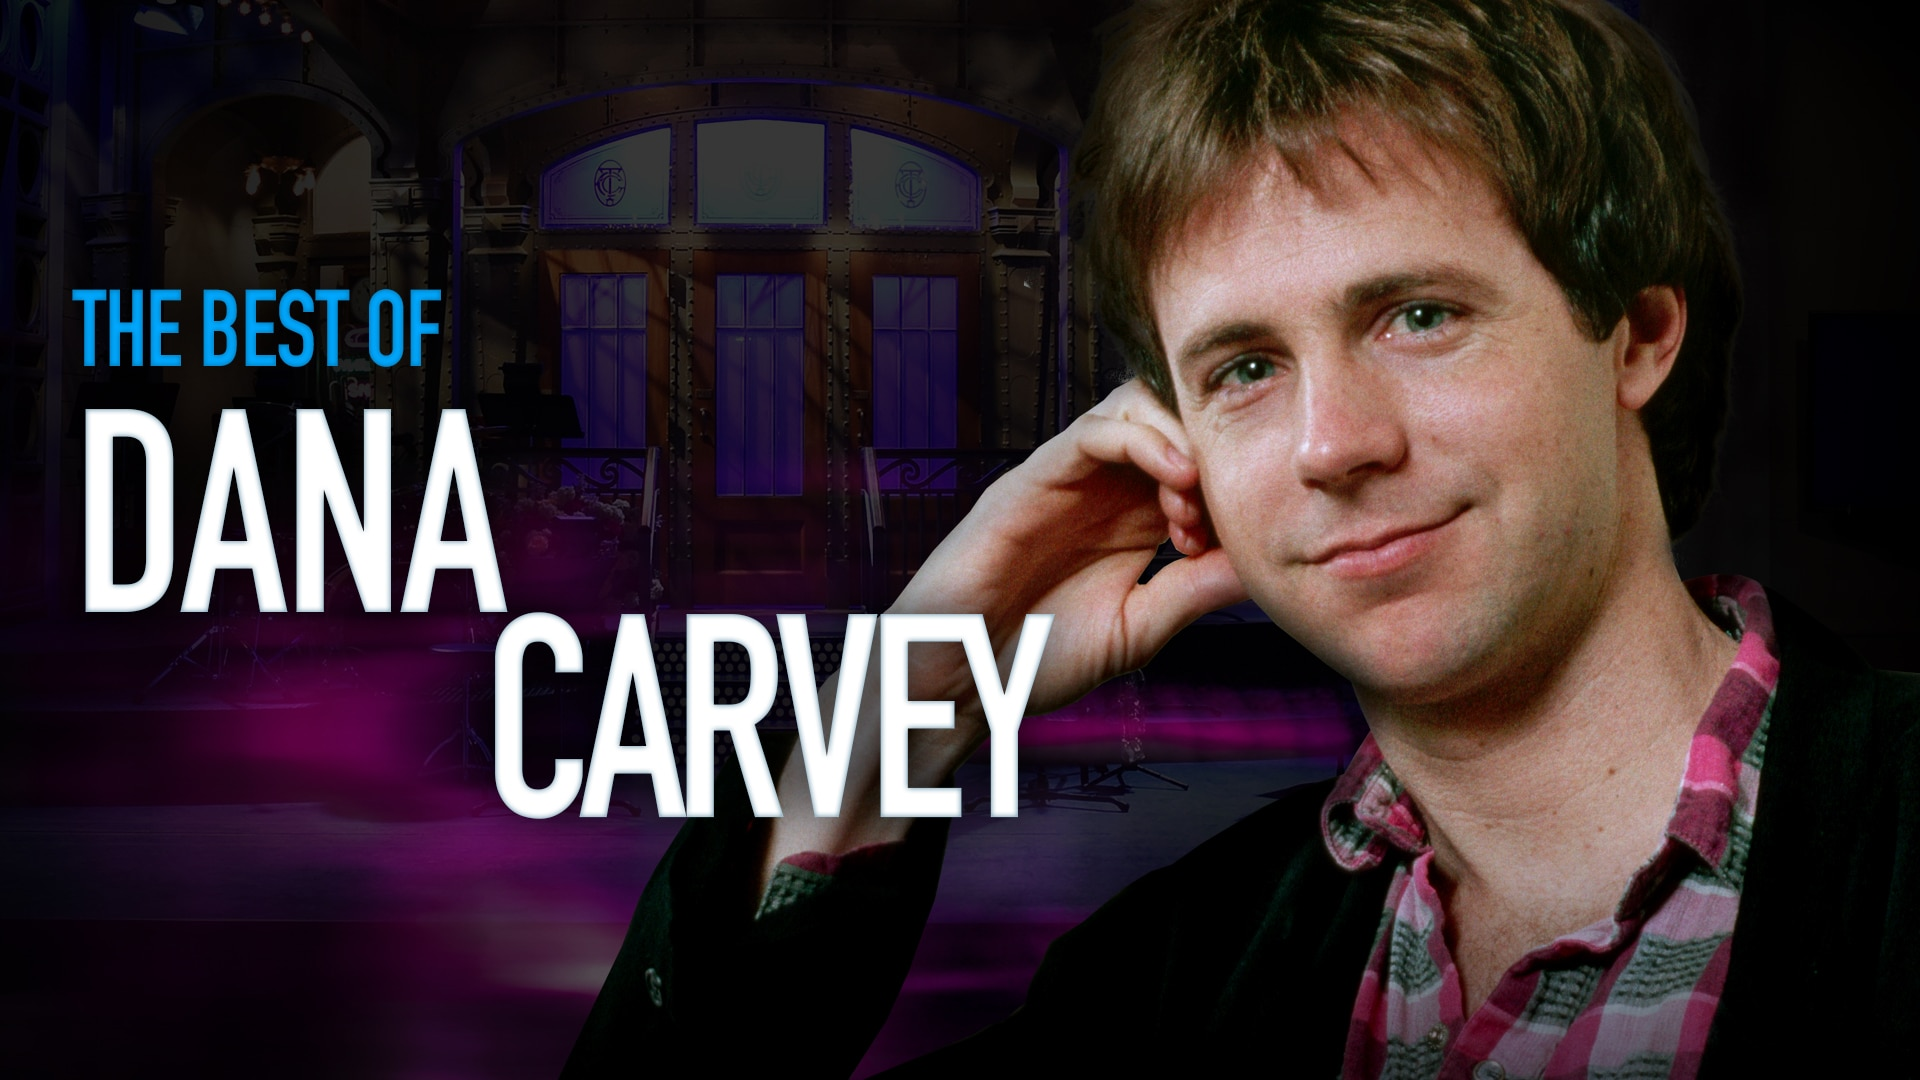 Best of Dana Carvey